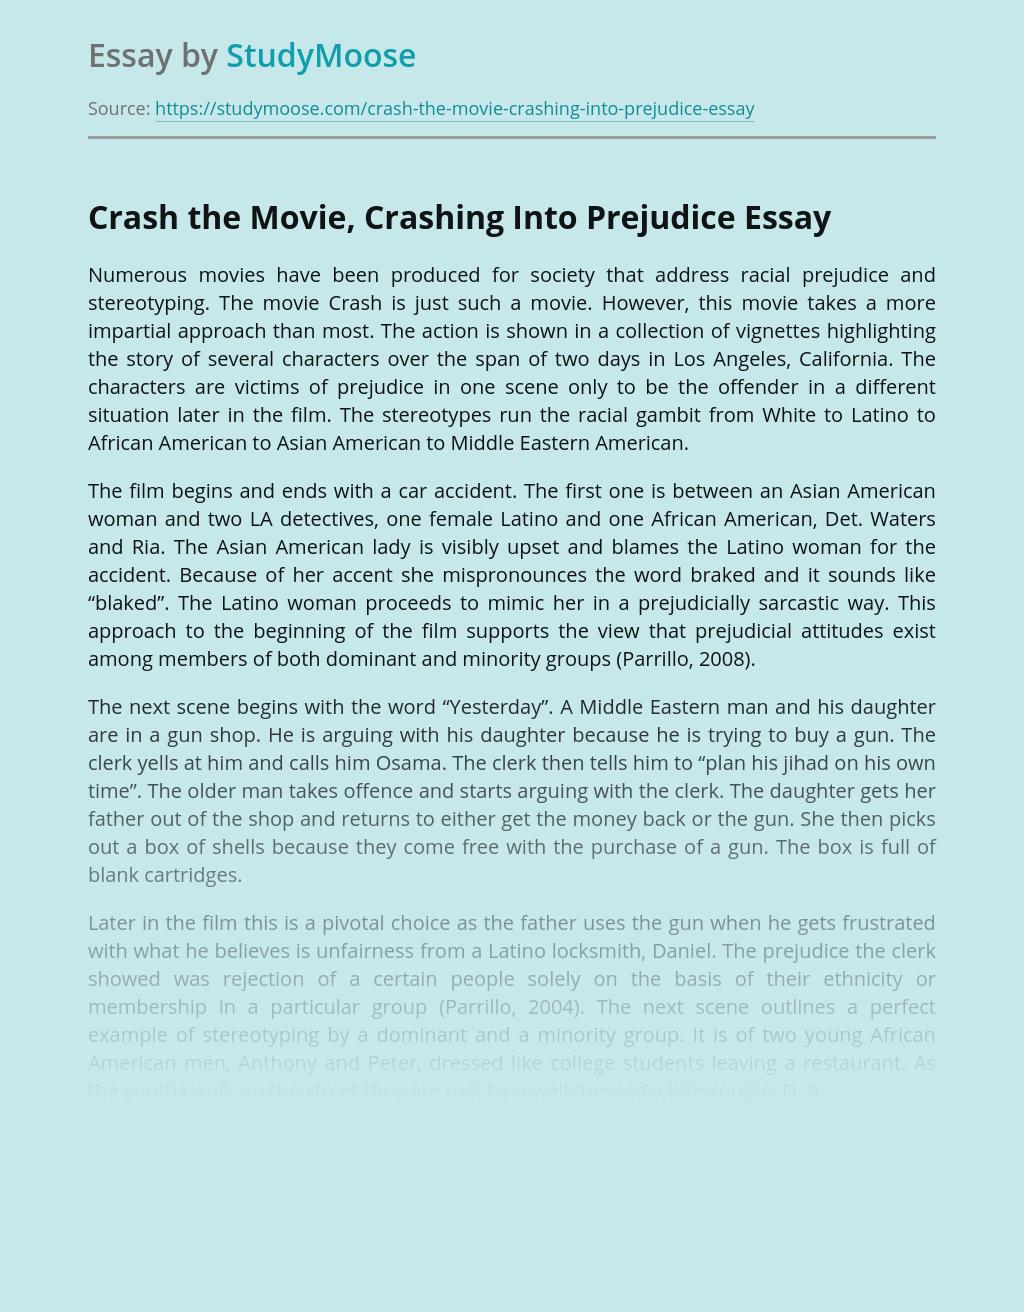 Crash the Movie, Crashing Into Prejudice